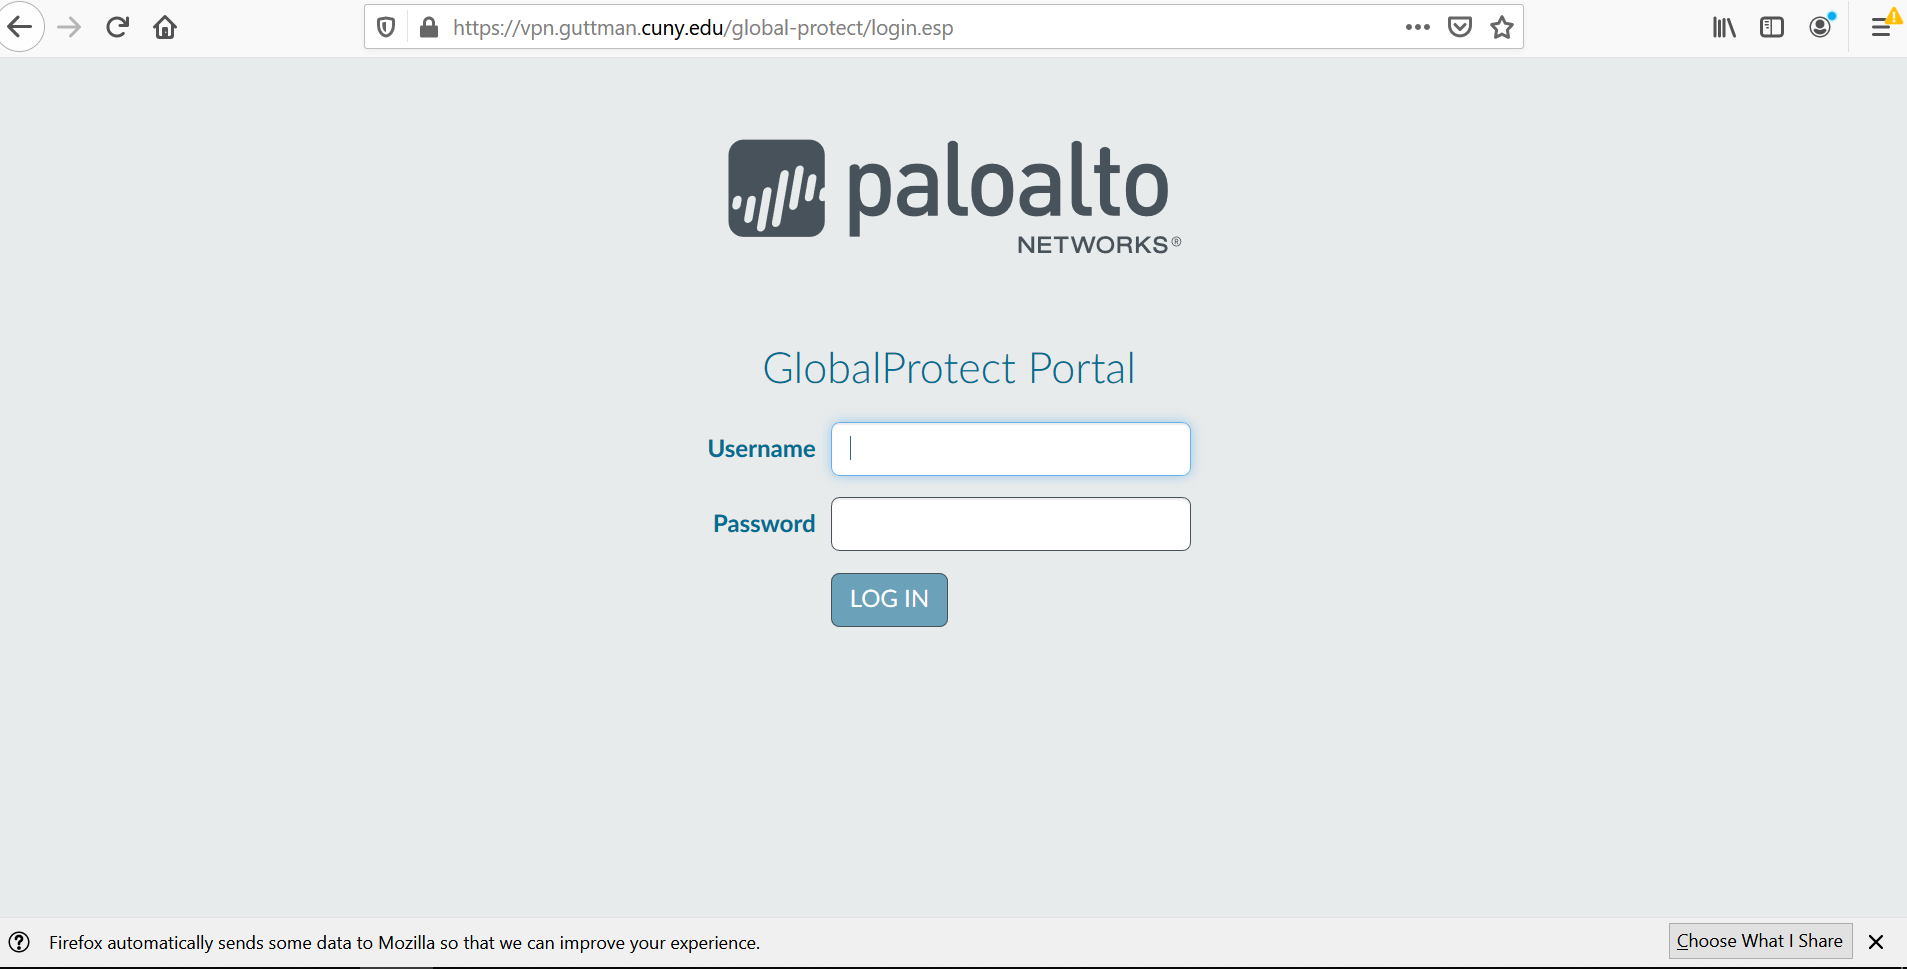 GlobalProtect Portal login screen